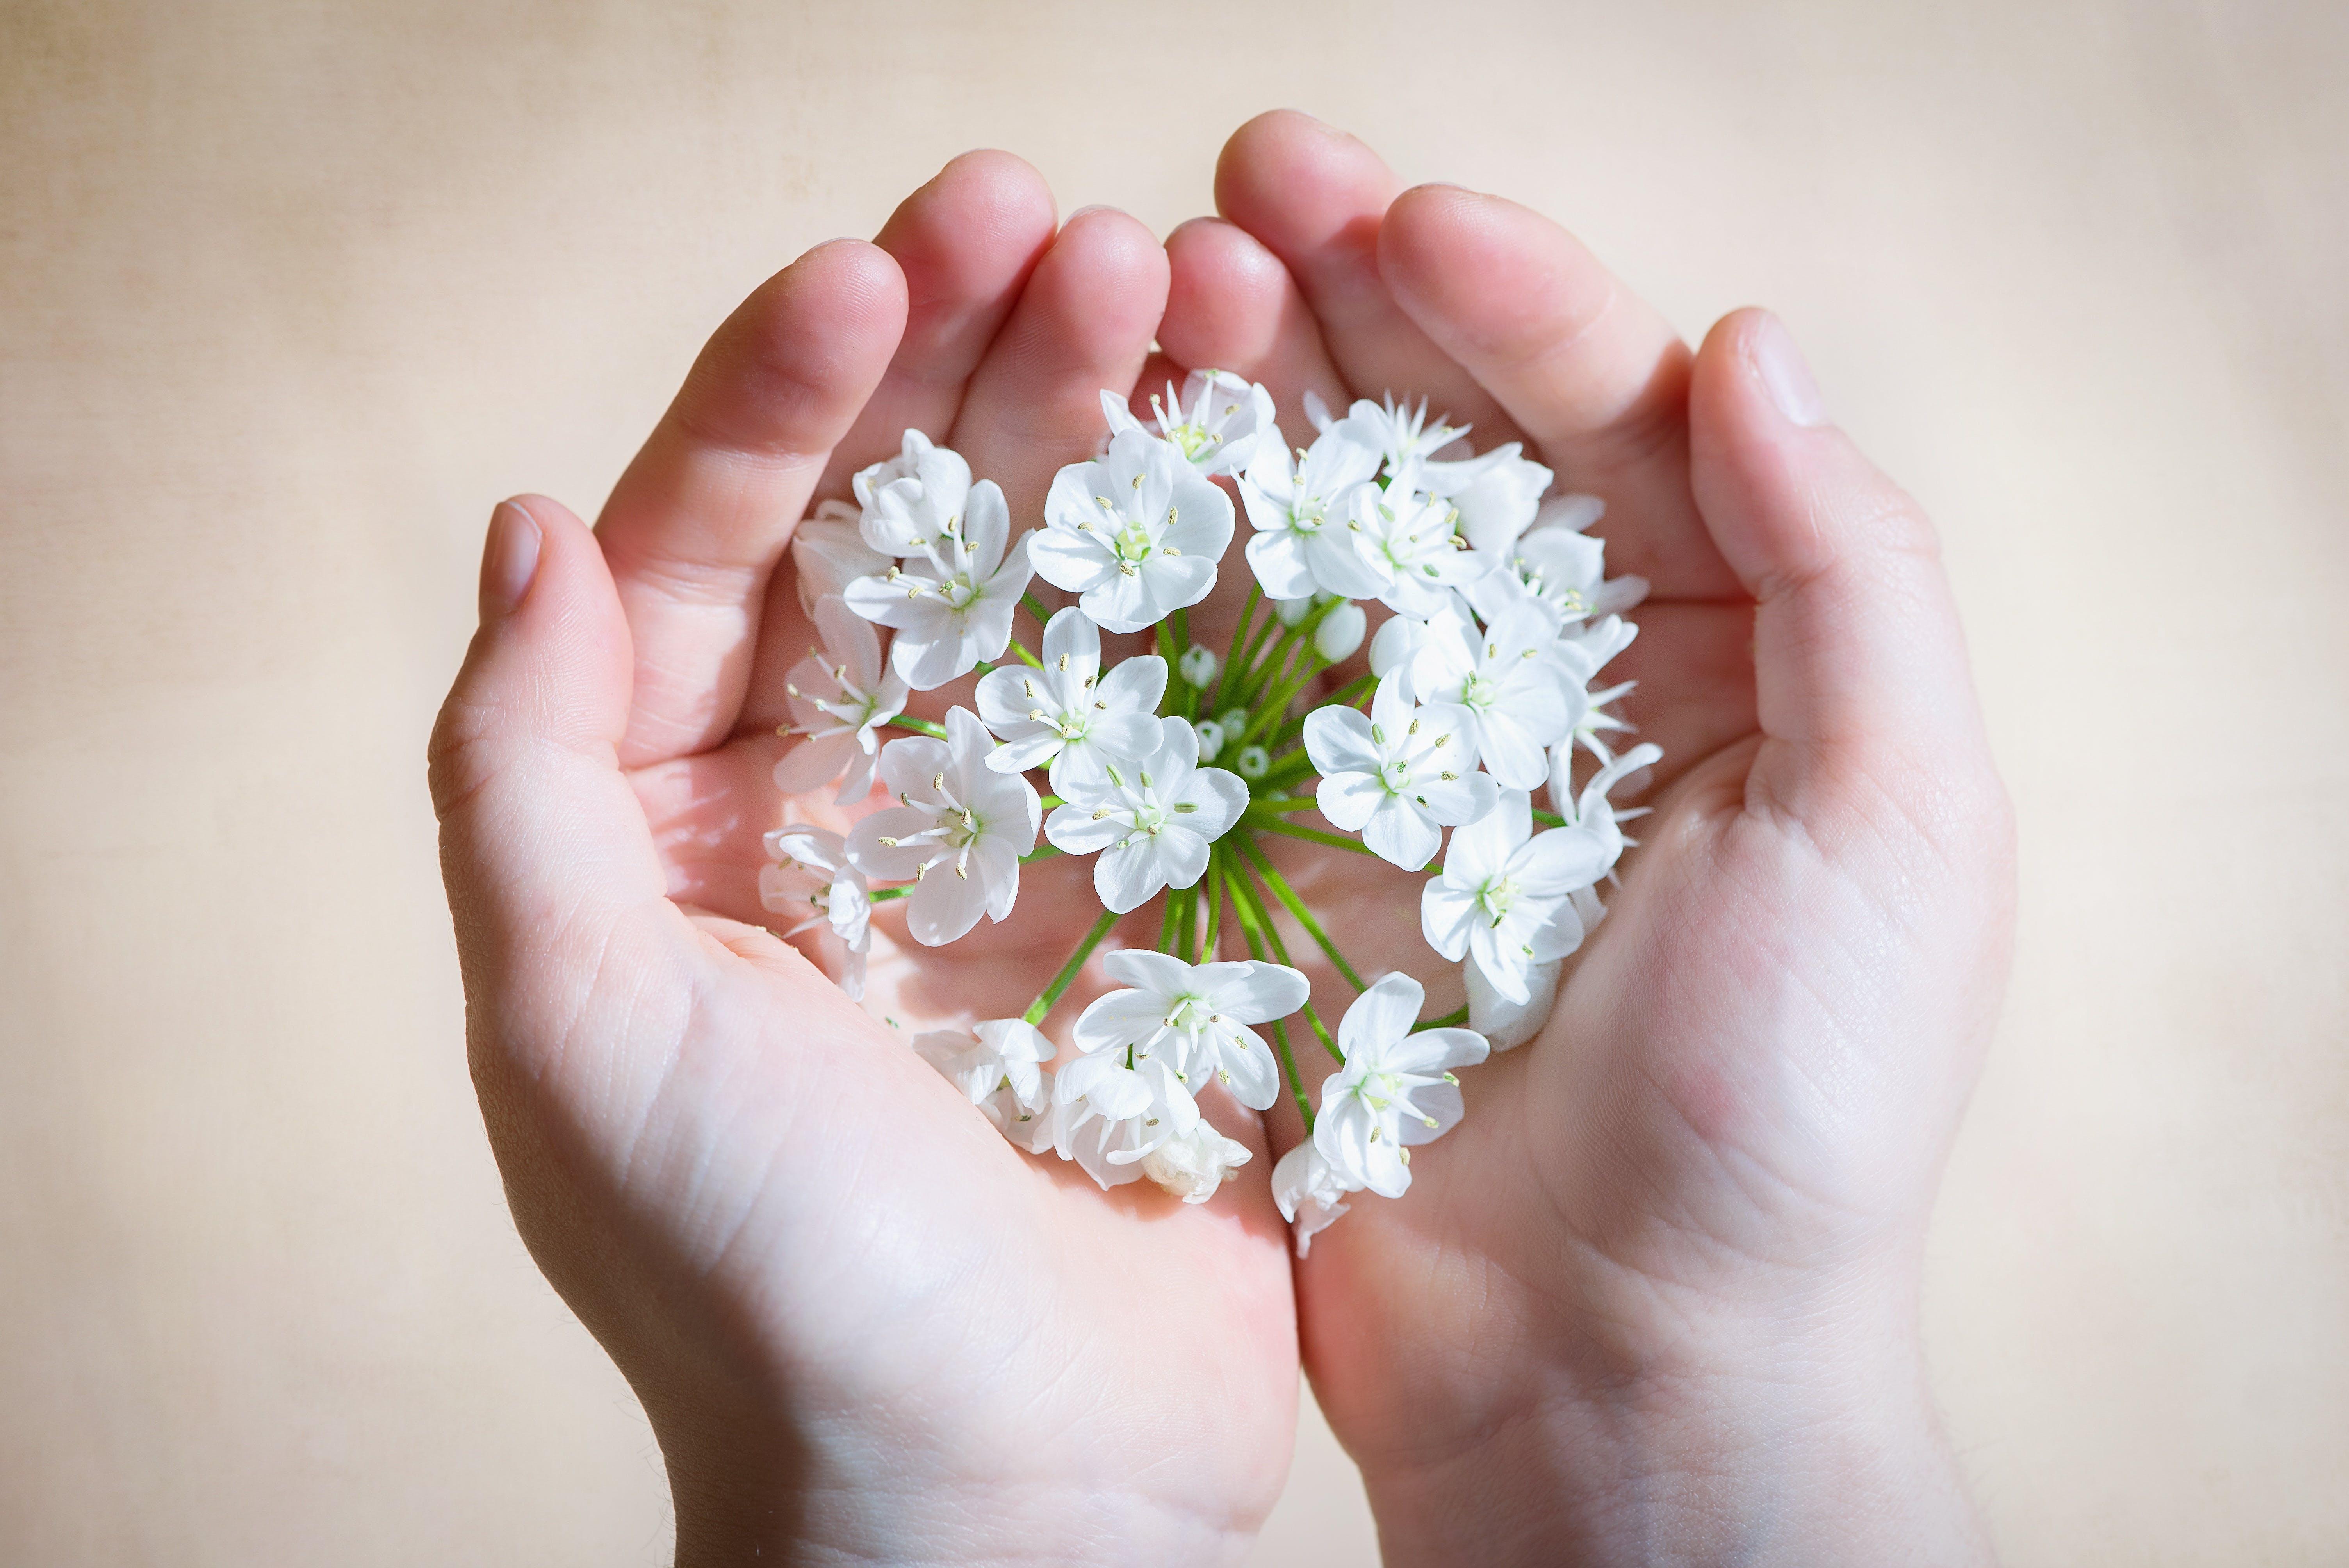 White Flower on Human Hands